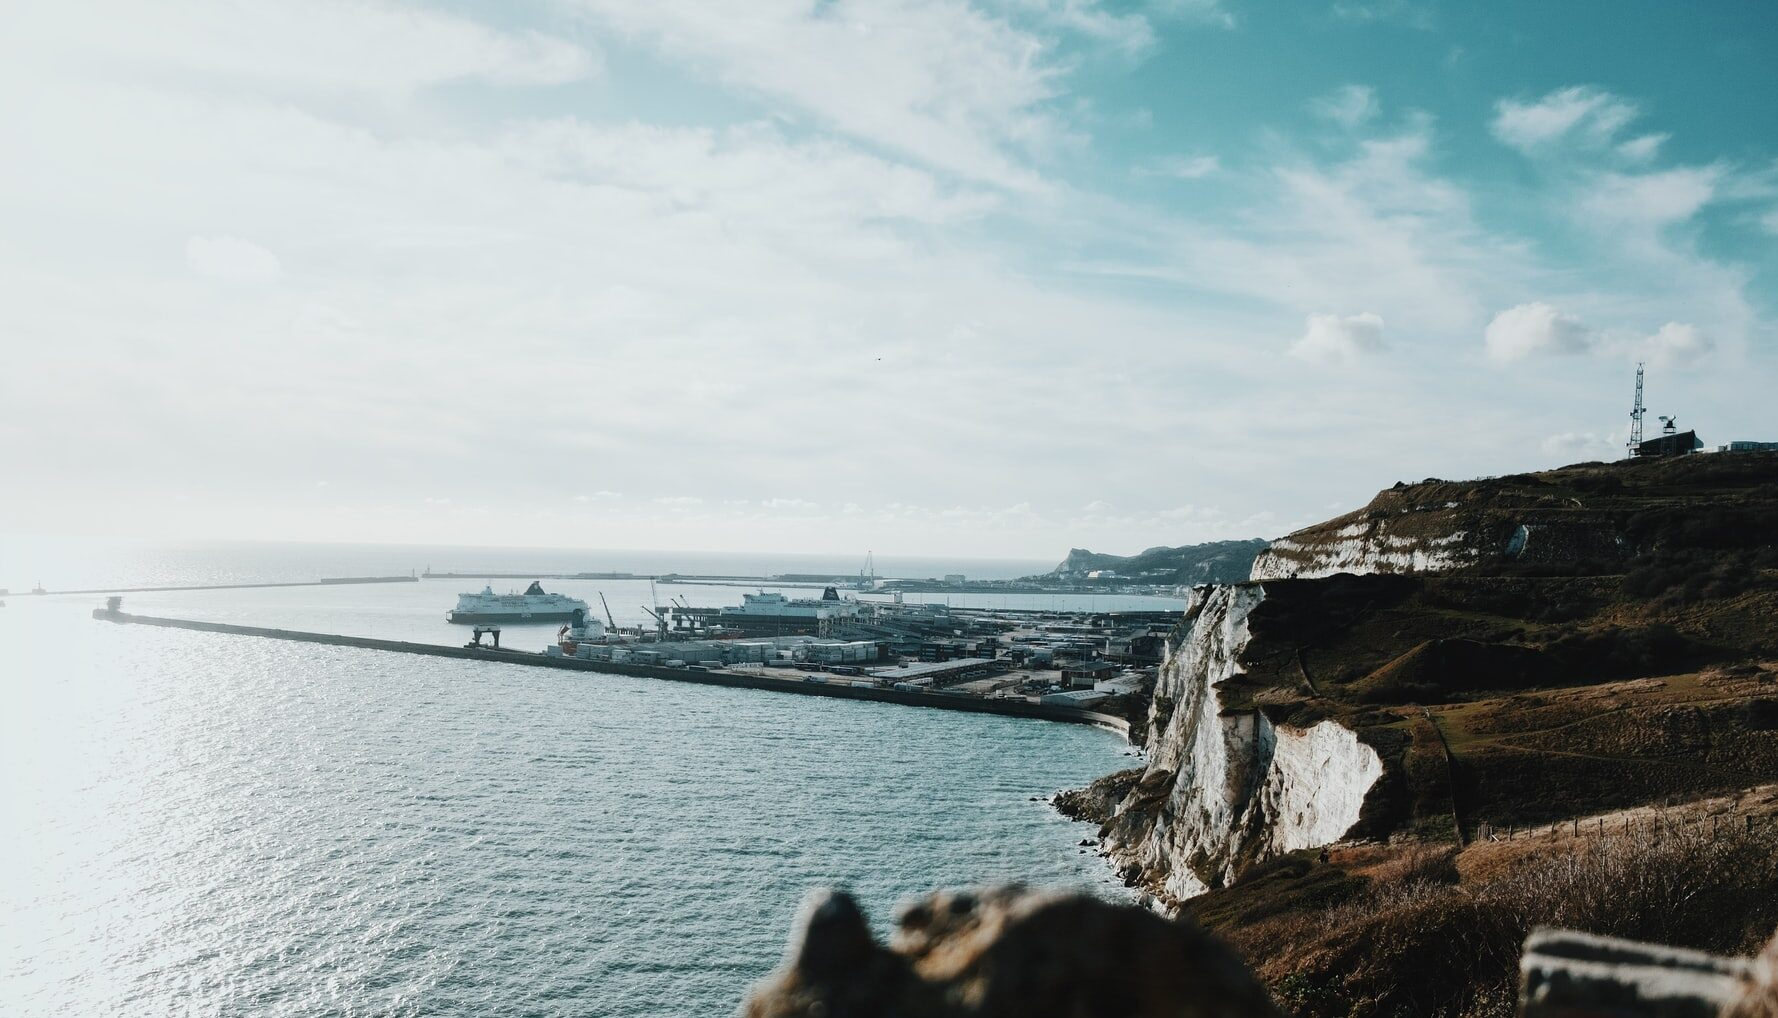 Port of Dover Border Control Post